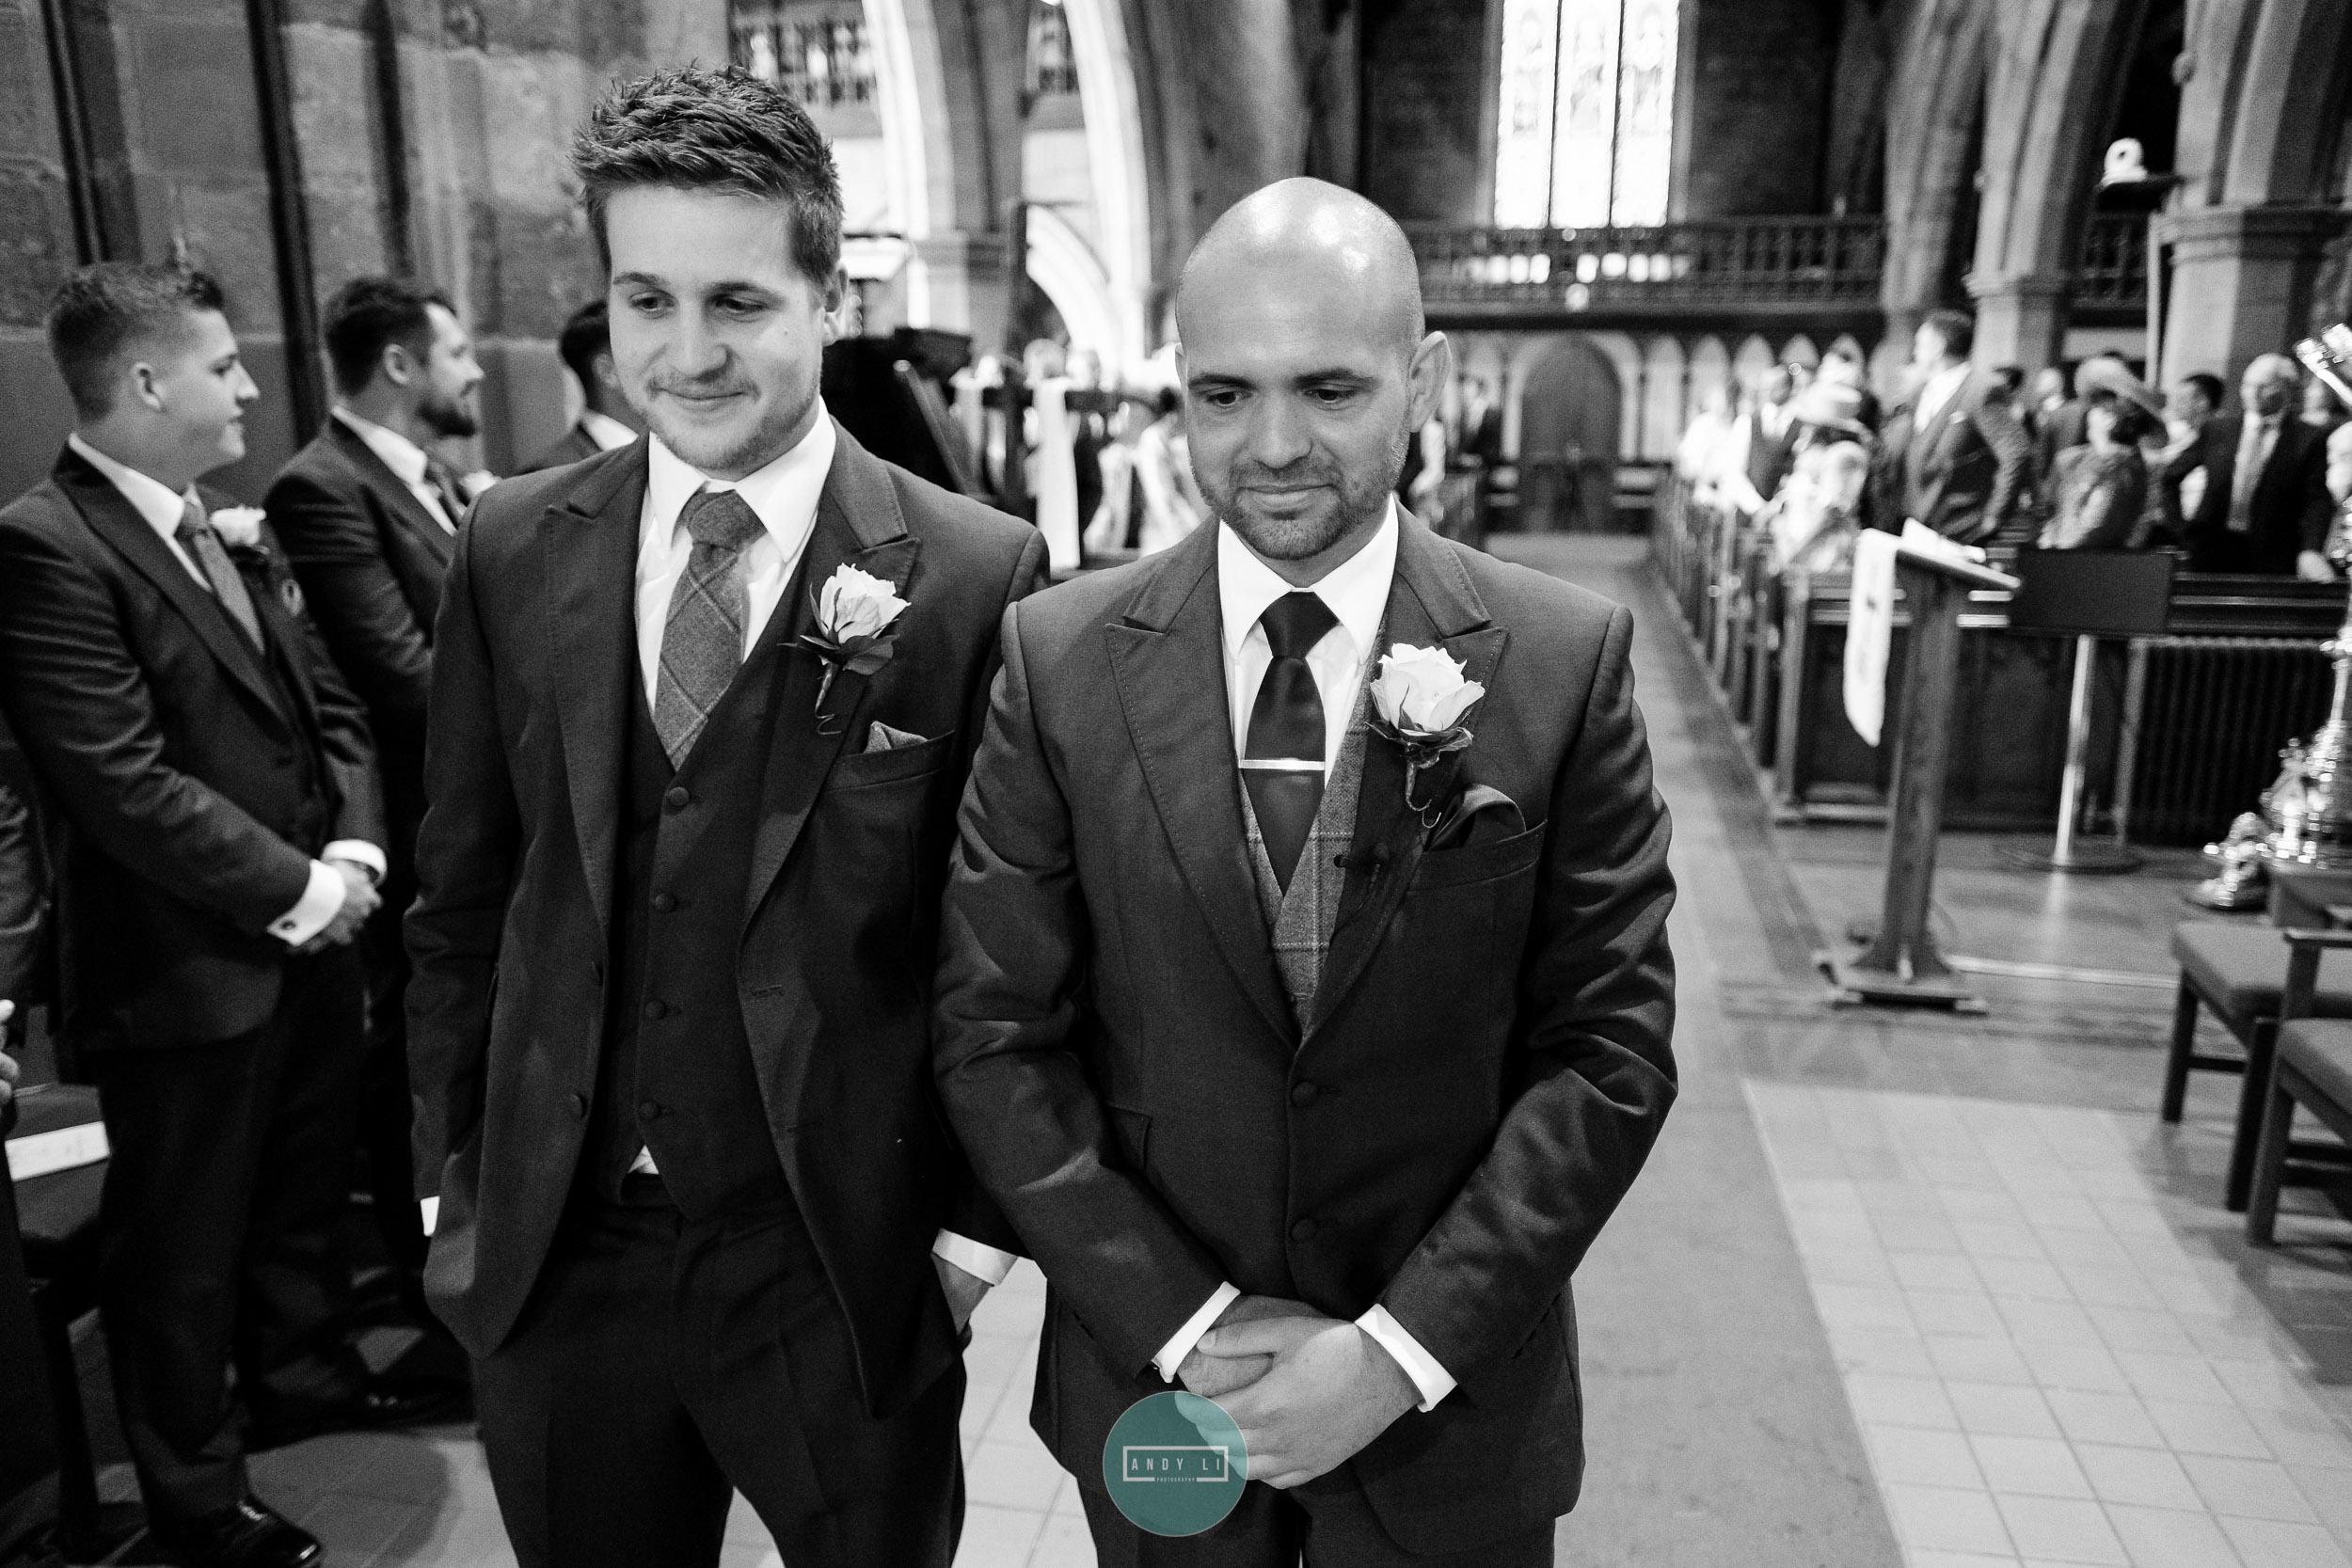 Lilleshall Hall Wedding Photographer-019-XPRO0585.jpg